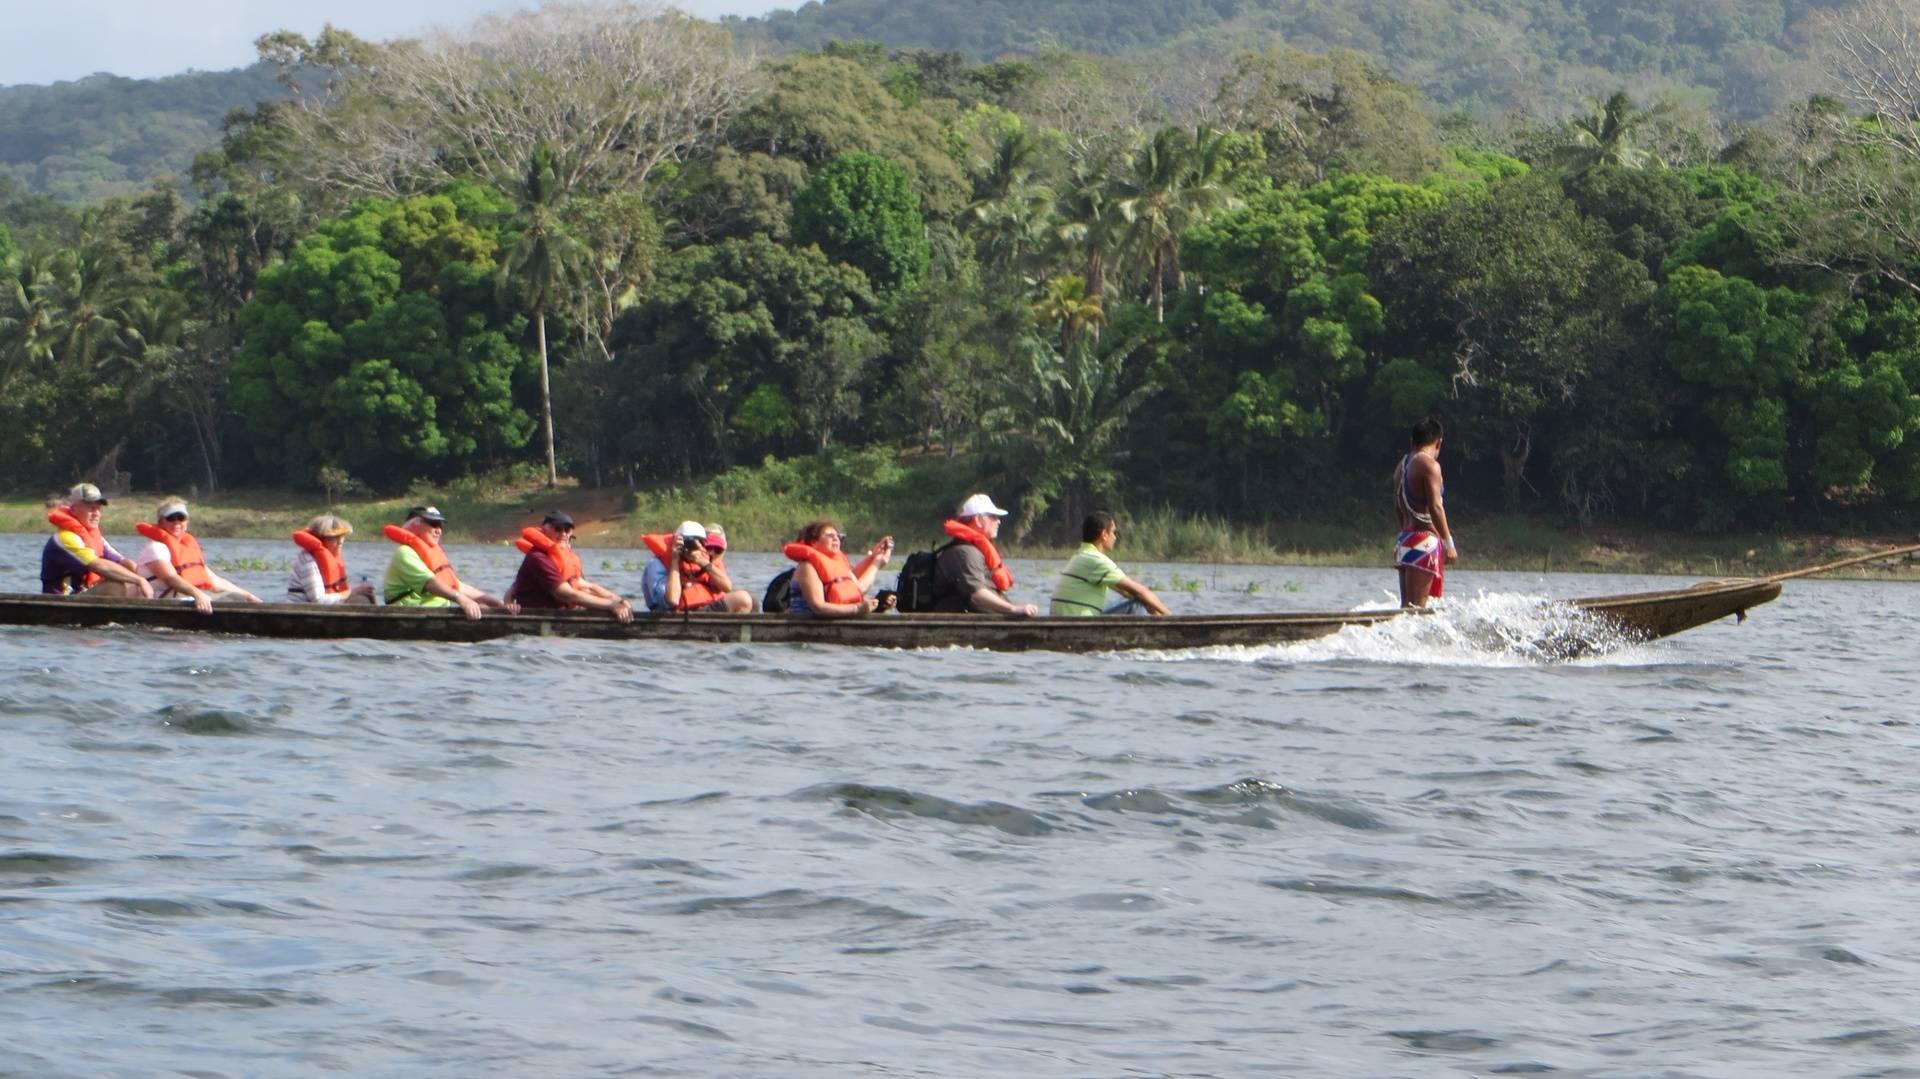 Dugout canoe rise at Embera Indigenous Village